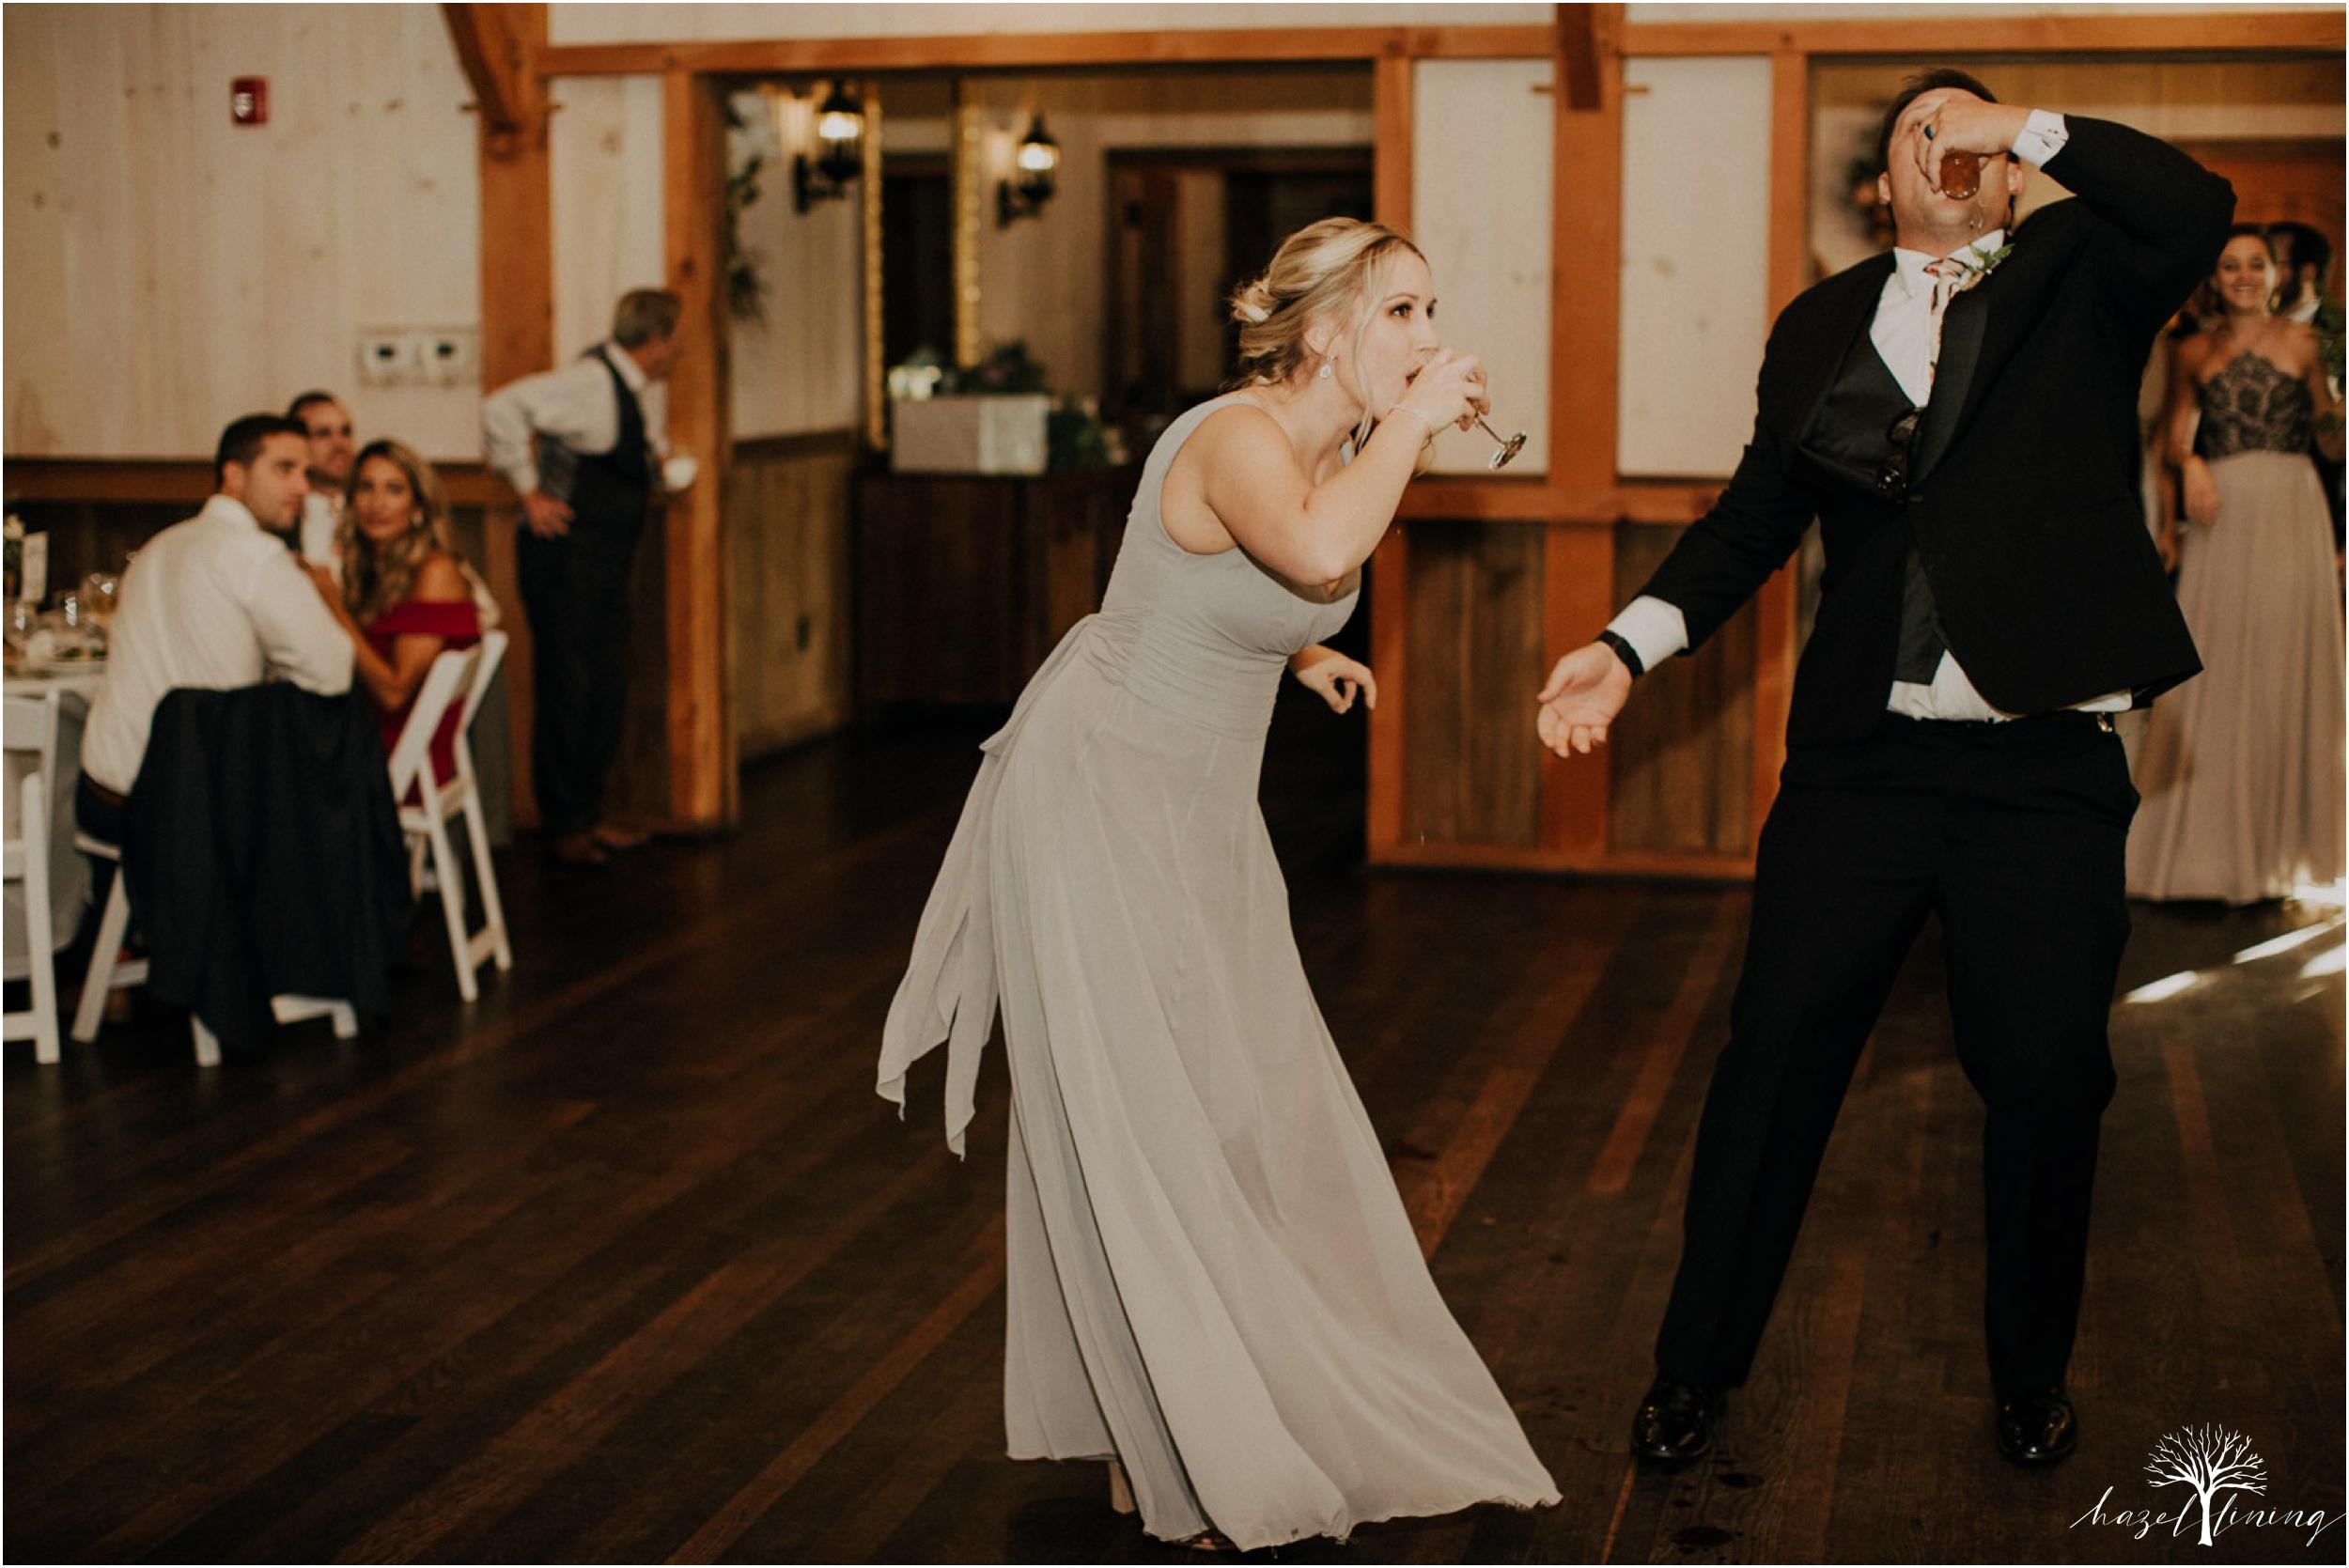 maureen-hepner-anthony-giordano-rose-bank-winery-newtow-pennsylvania-luxury-summer-wedding-hazel-lining-photography-destination-elopement-wedding-engagement-photography_0129.jpg